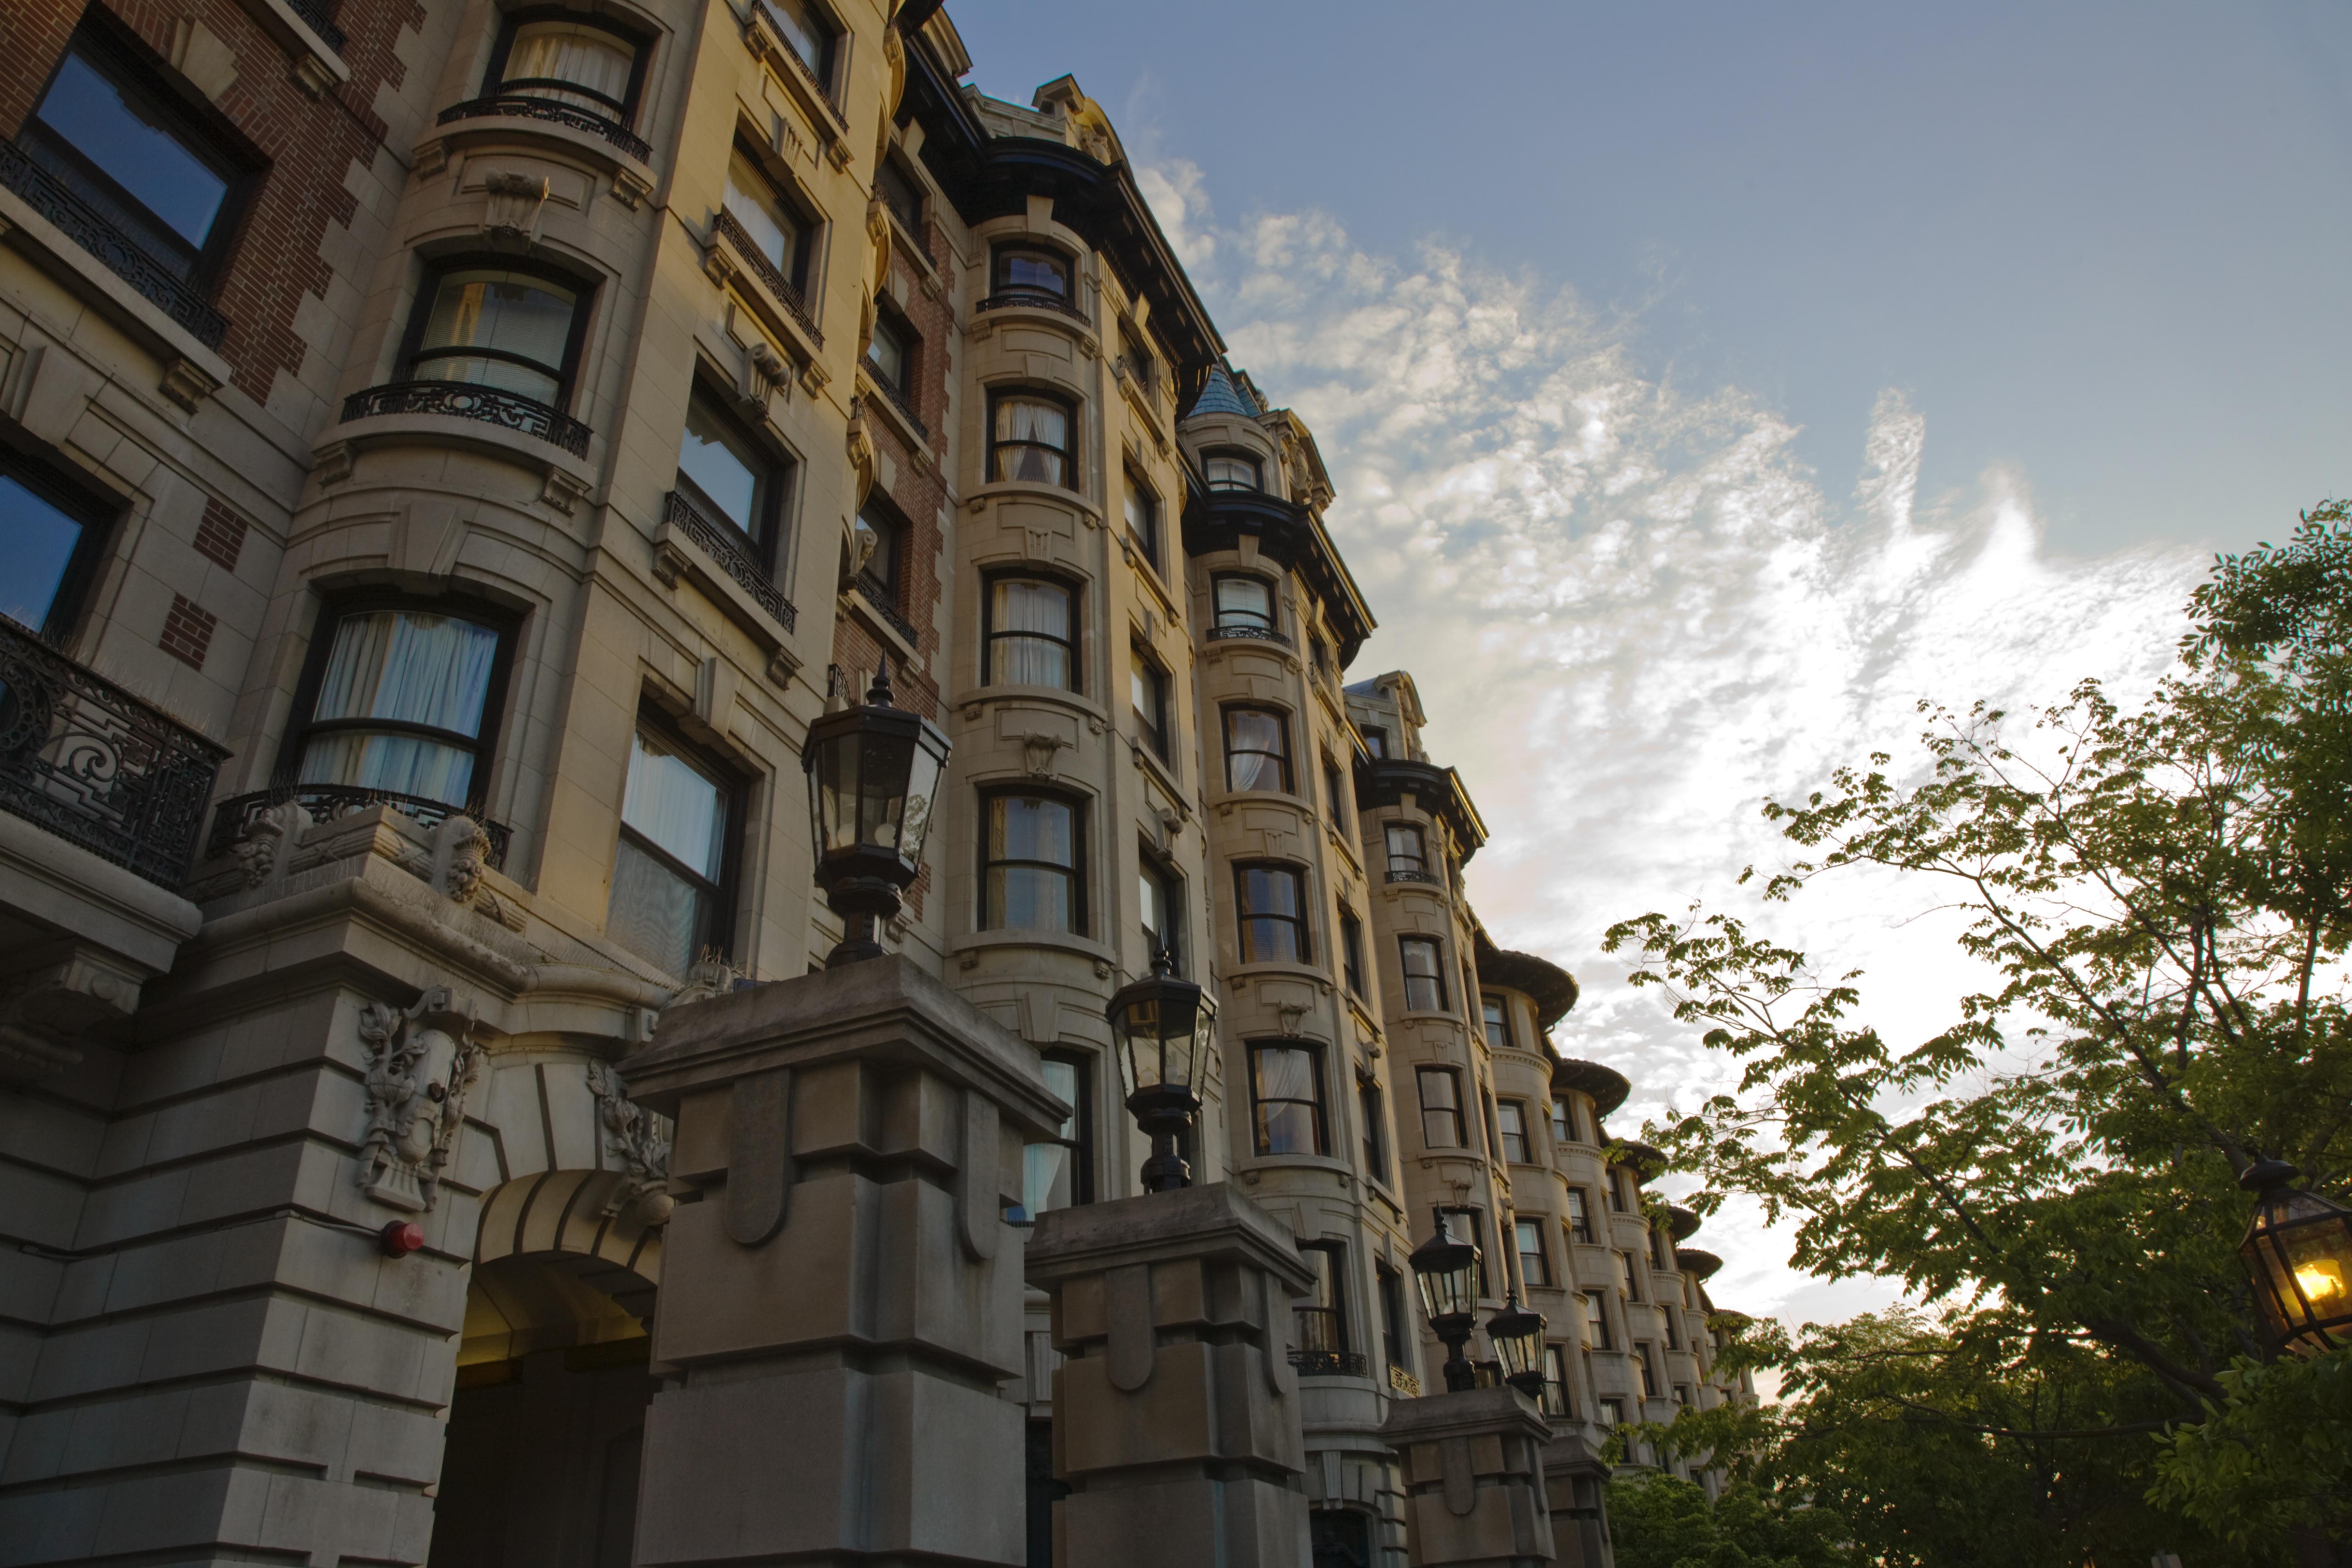 Classic Stone Buildings Along Commonwealth Avenue, Boston, Massachusetts